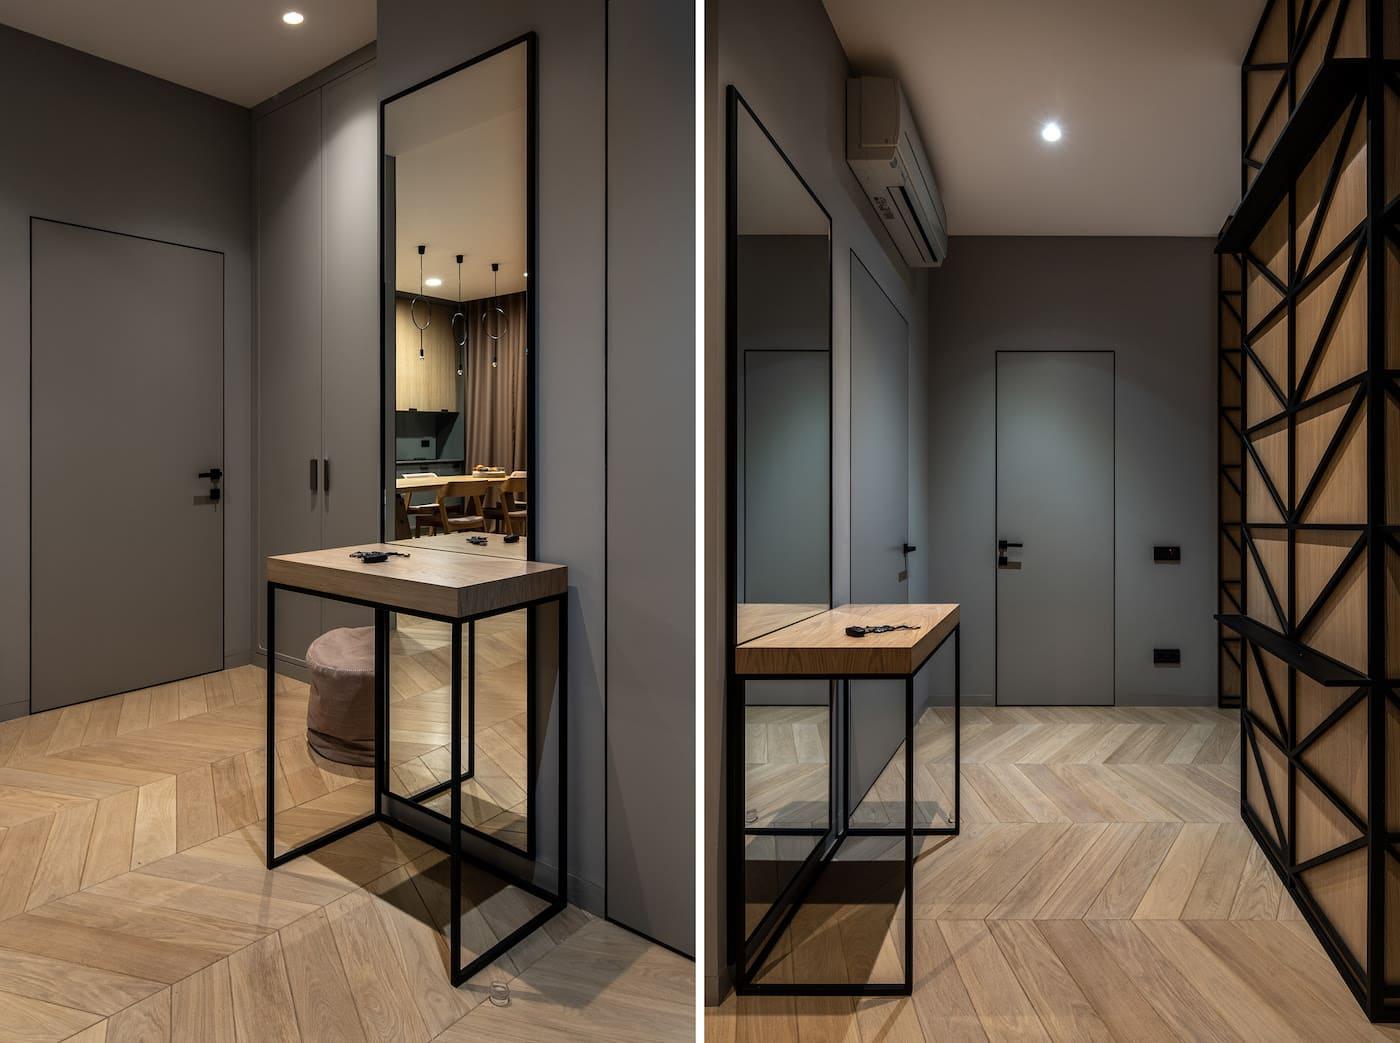 модный дизайн интерьера квартиры фото 48